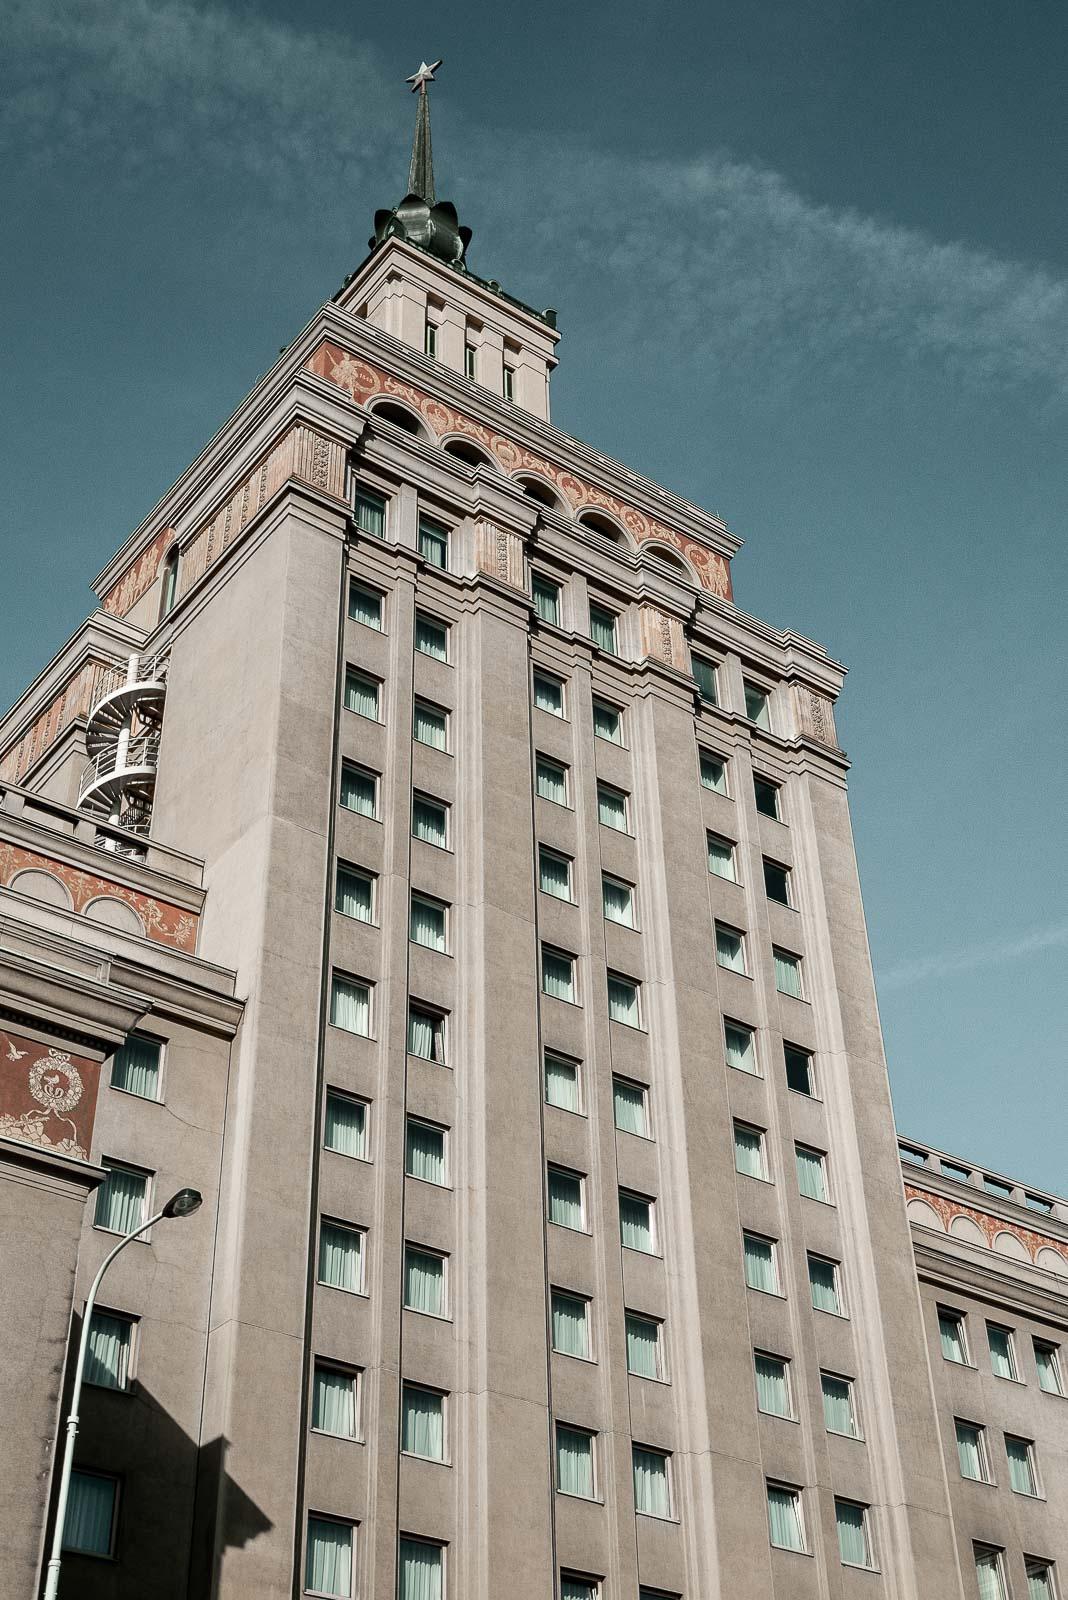 L'hôtel Staline à Prague